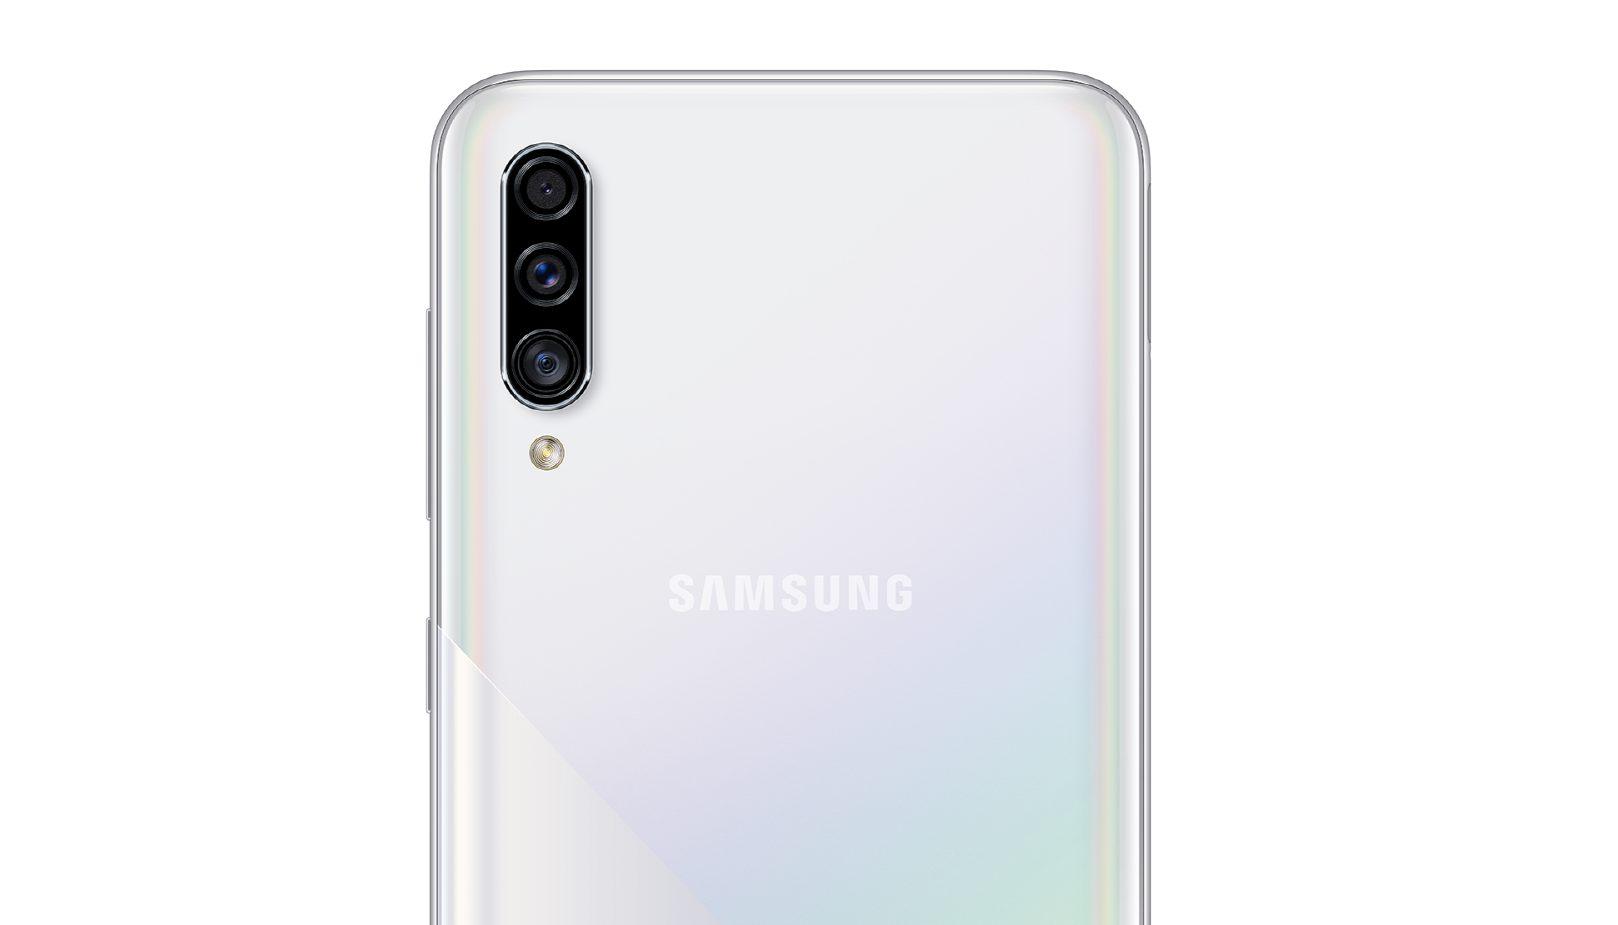 Samsung Galaxy A30s White back camera